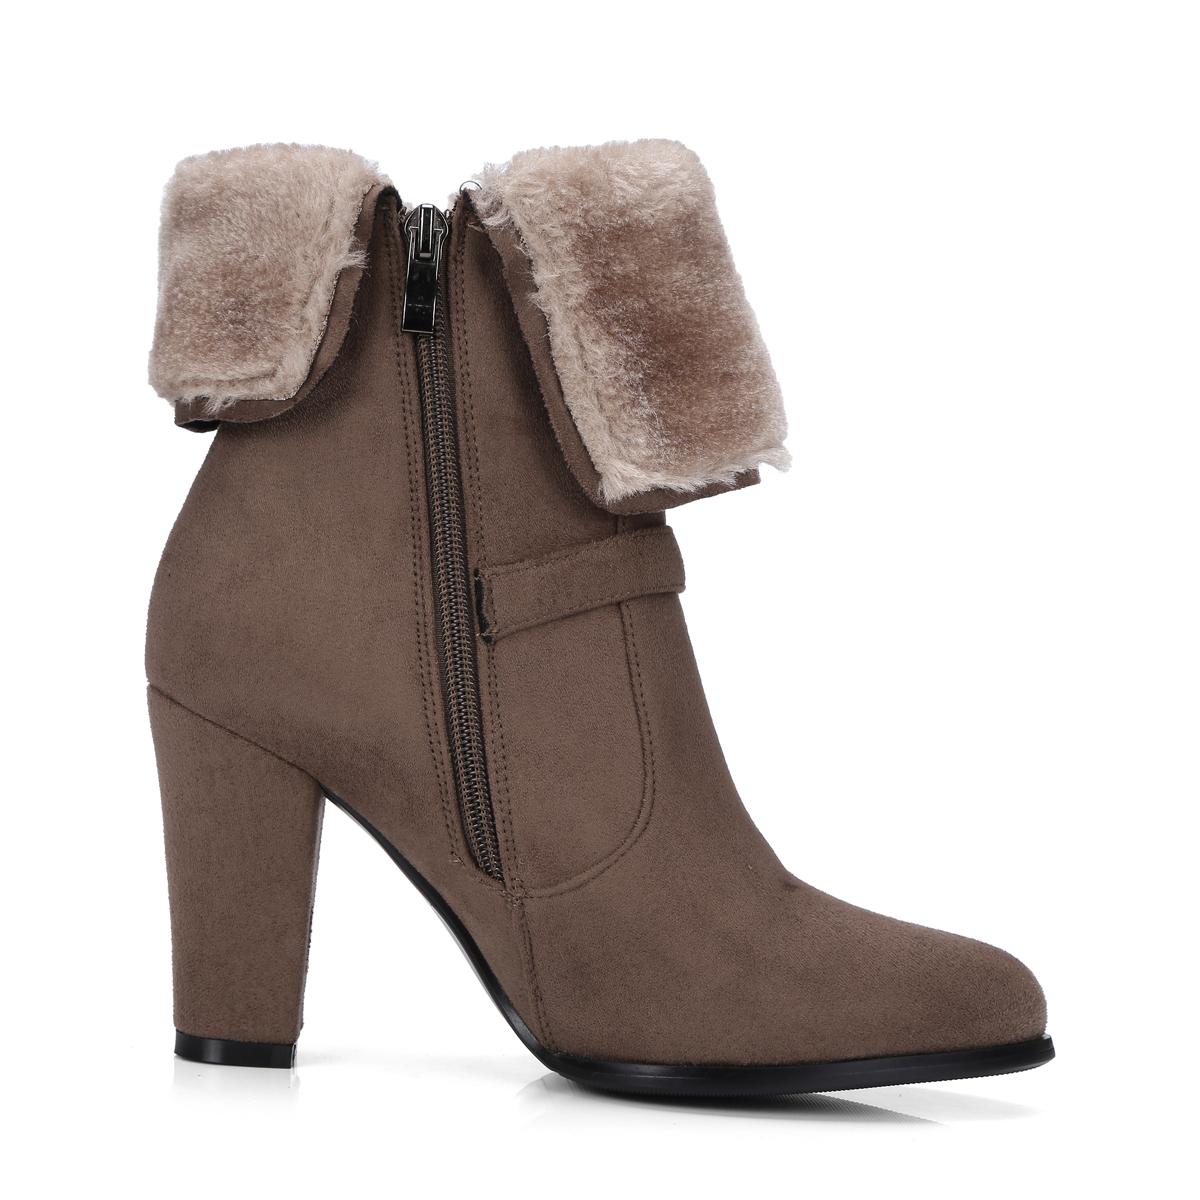 4384e3d2552a NEMAONE Winter Women Round Toe Ankle Boots High Heels Shoes Double ...